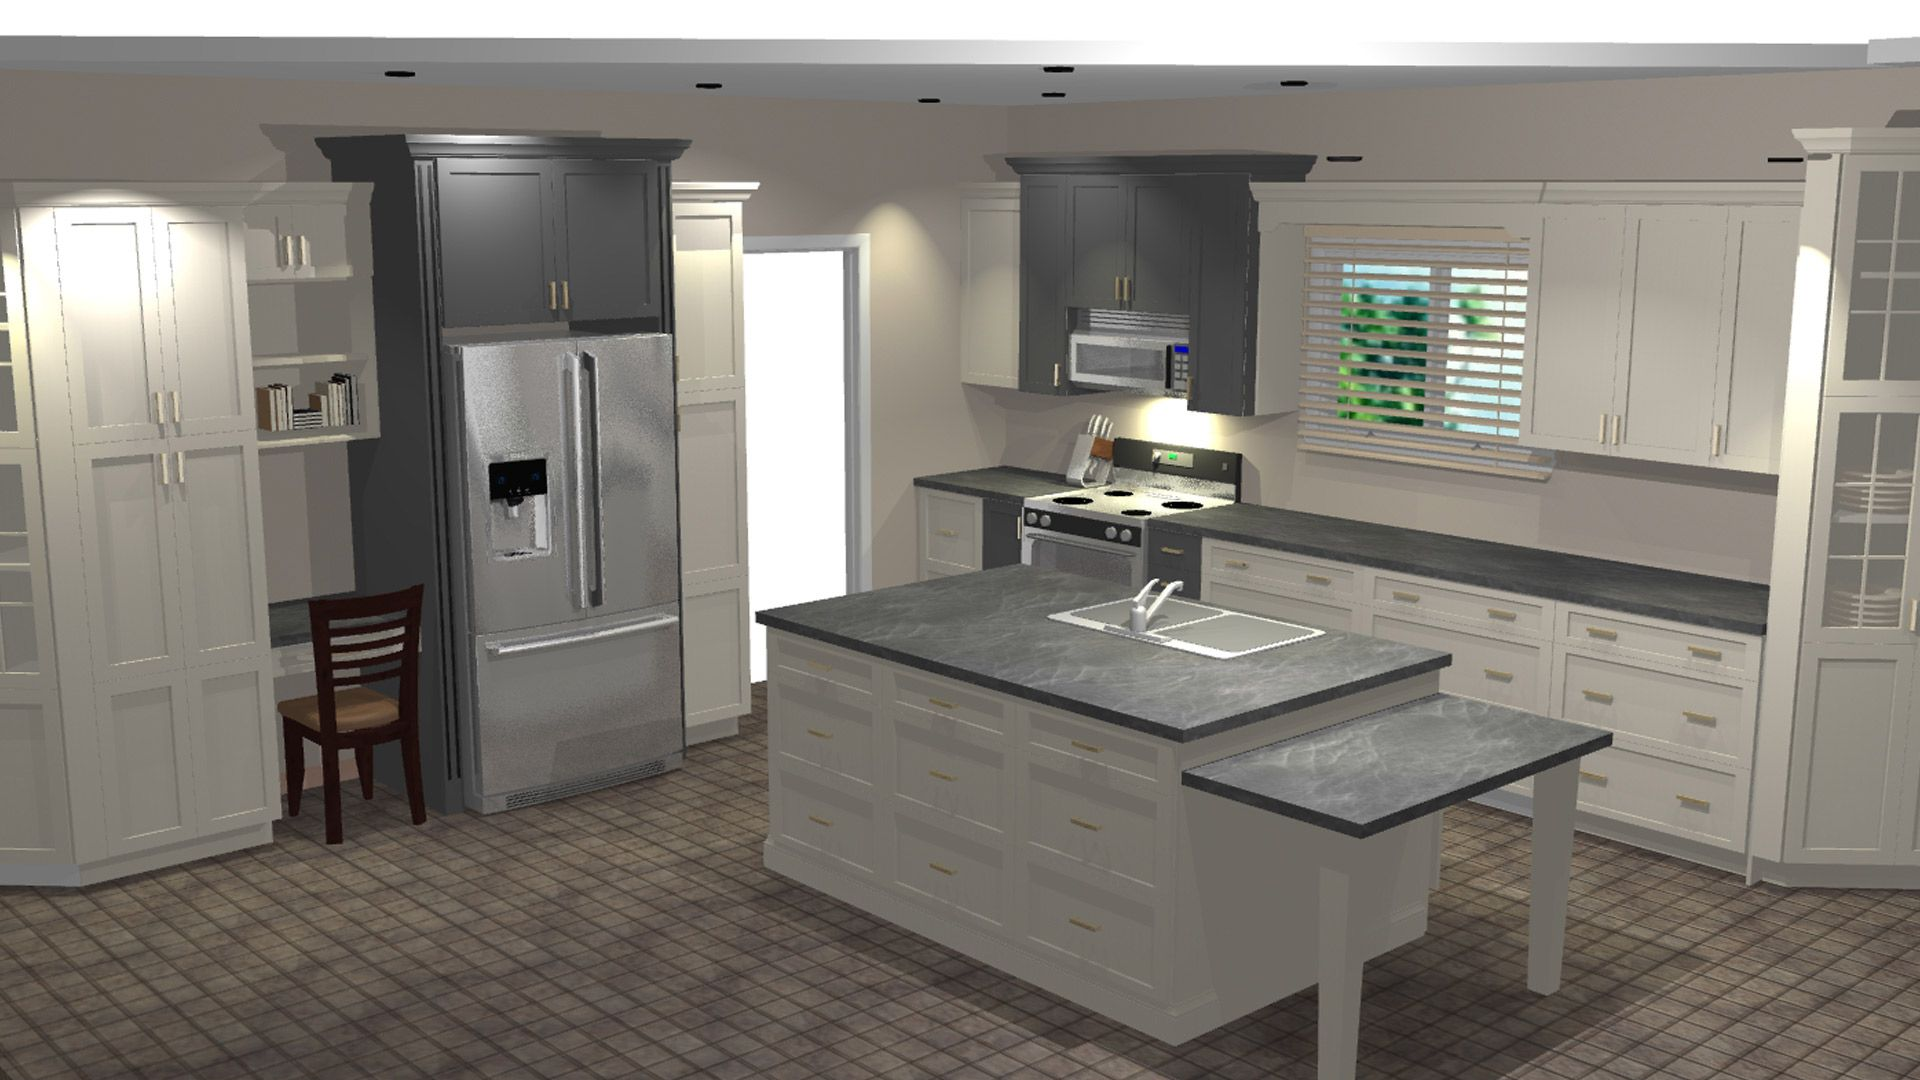 2020 Design | Kitchen inspiration design, 2020 design ...